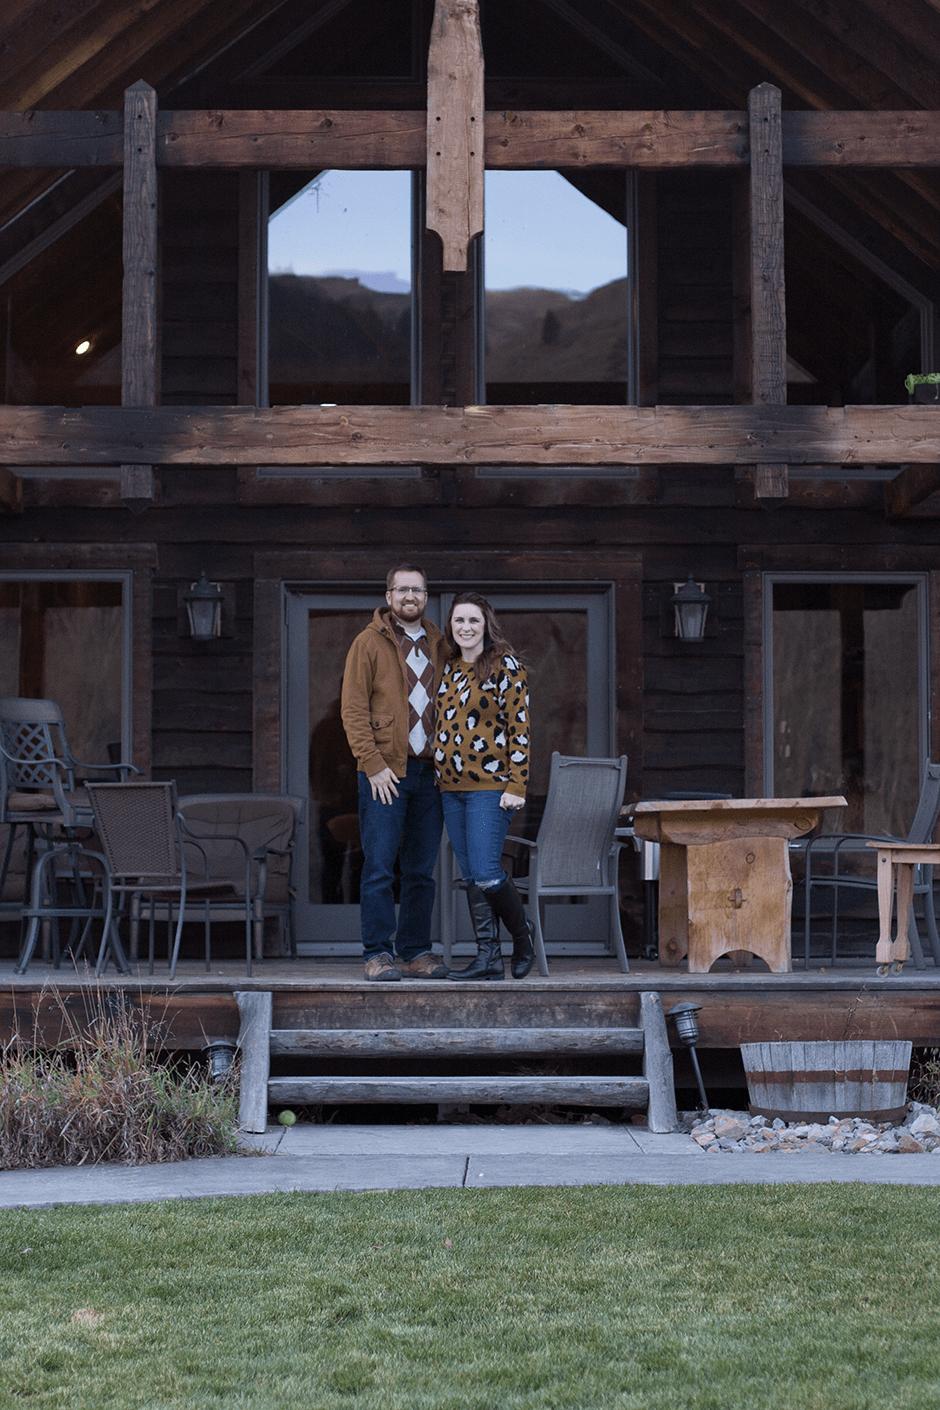 cabin-family-vacation